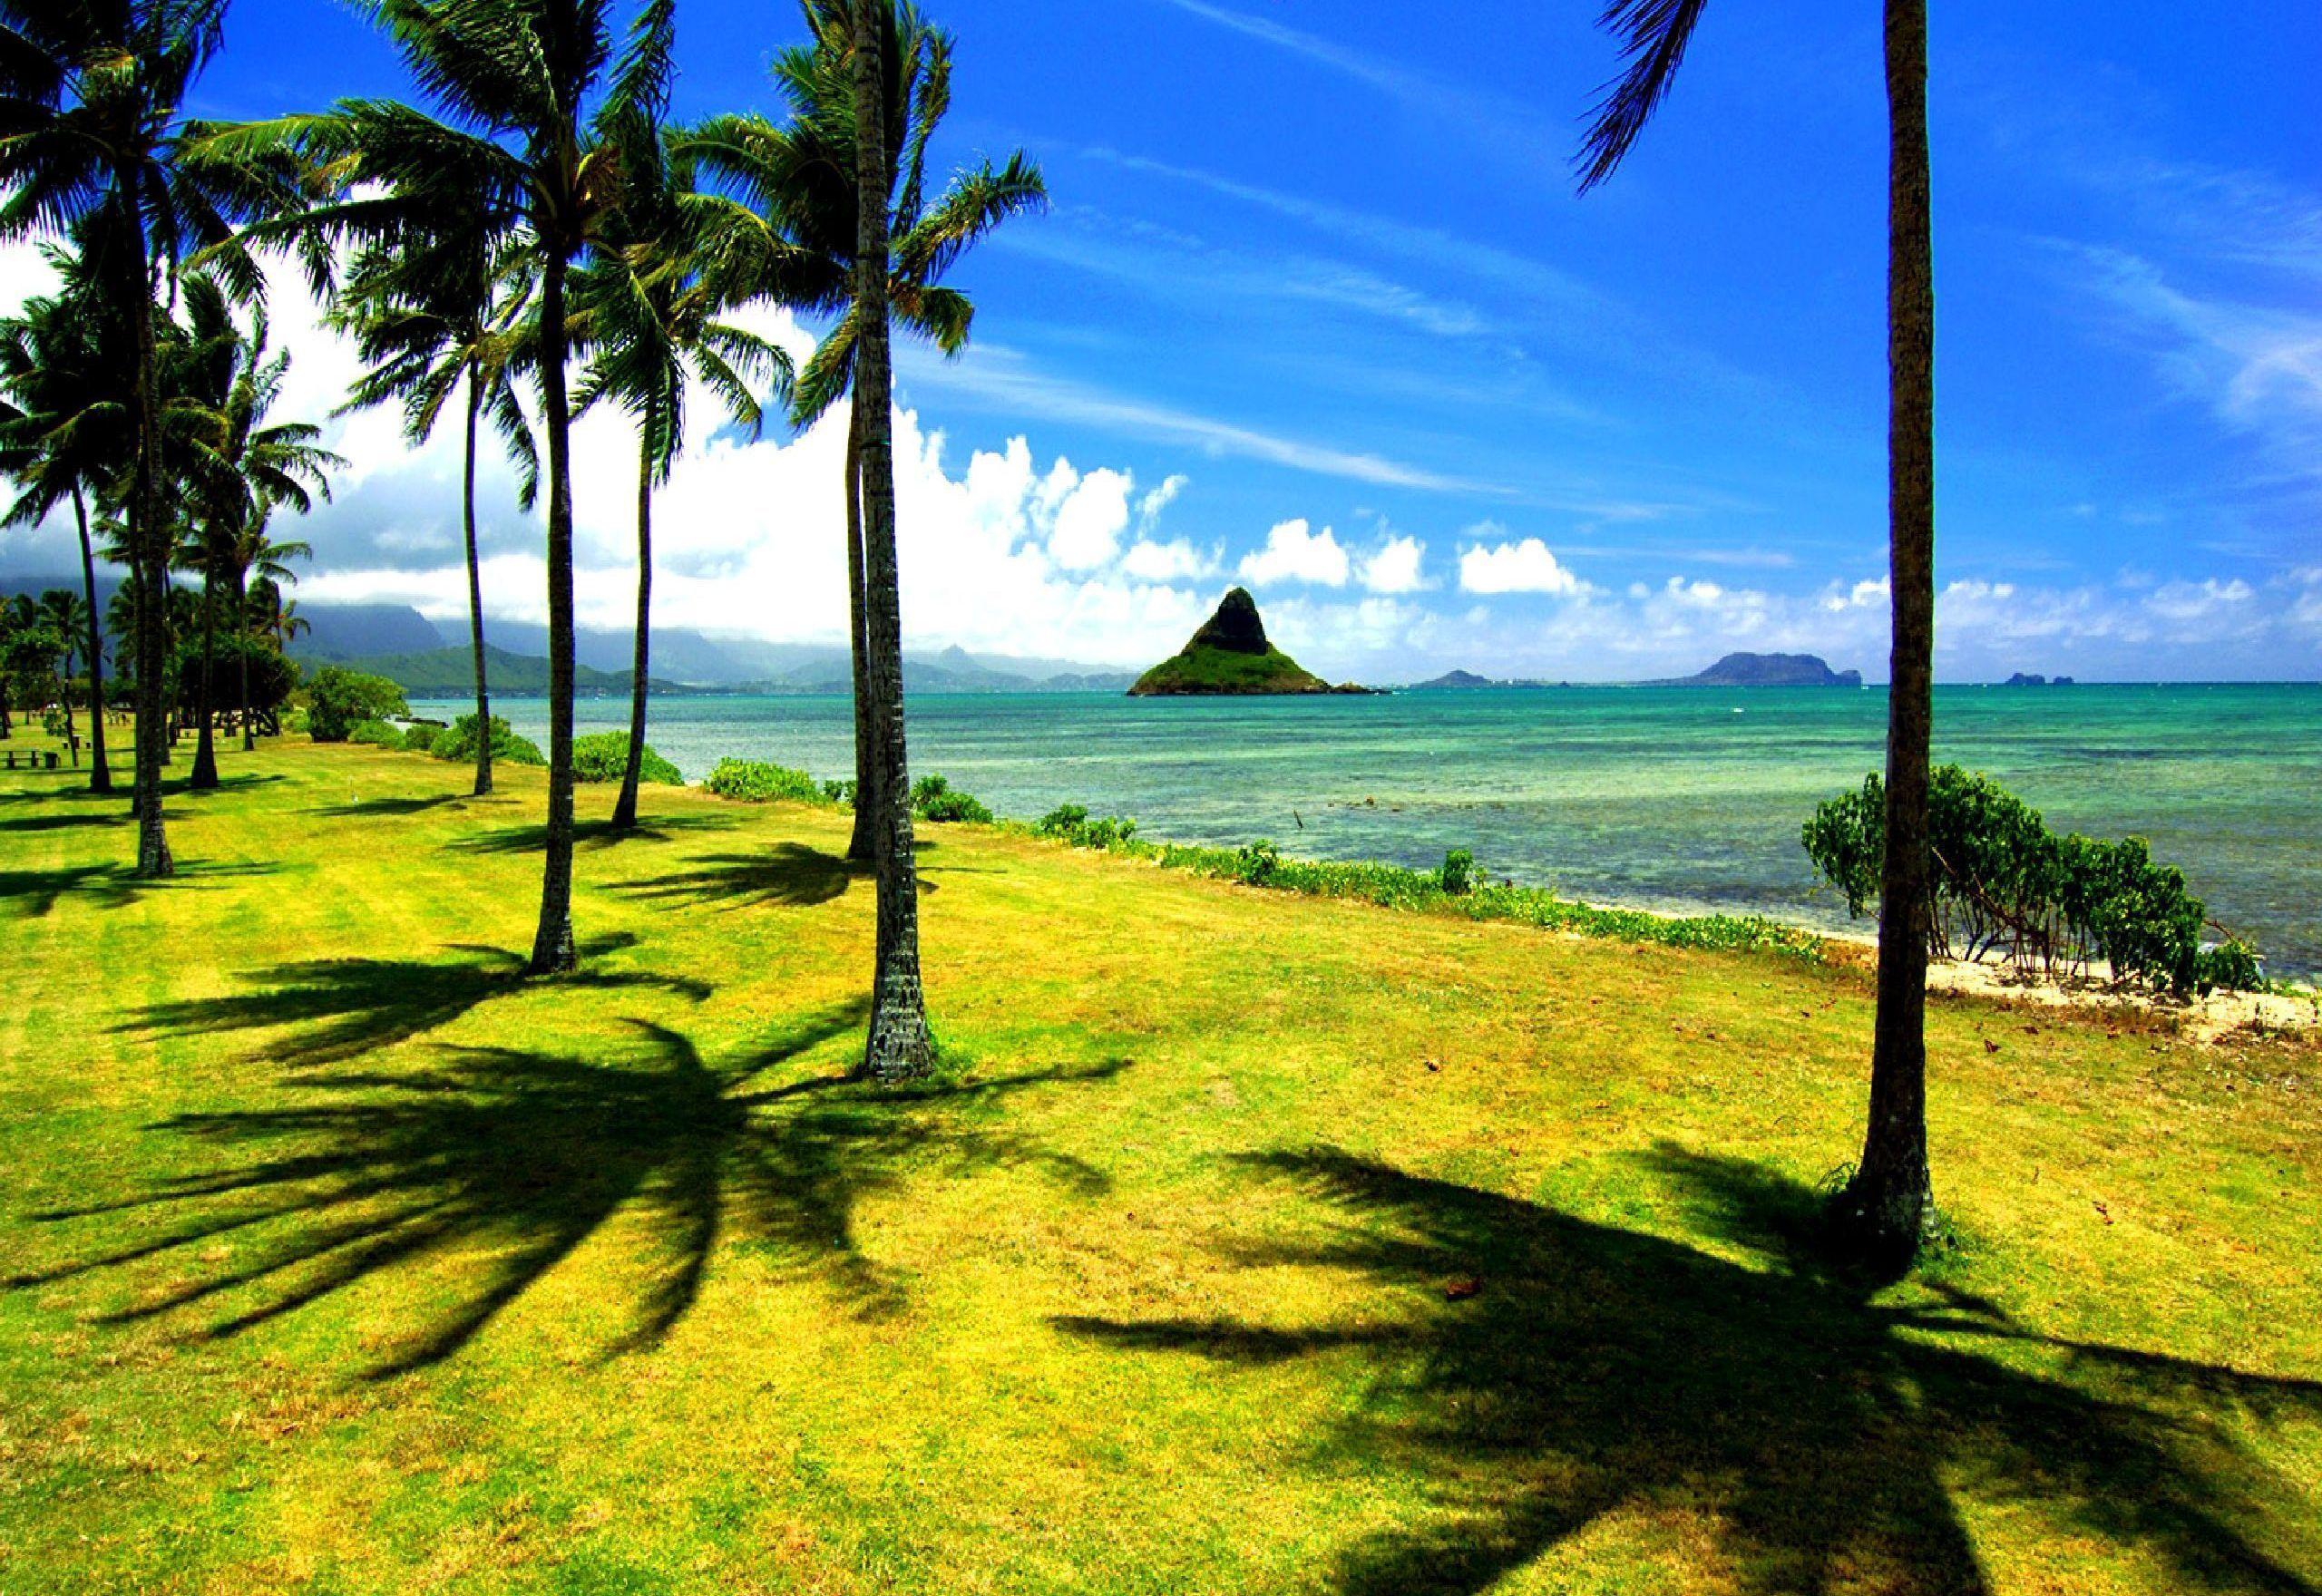 Wallpaper beach palm trees beach ocean wallpapers nature   download 2560x1760